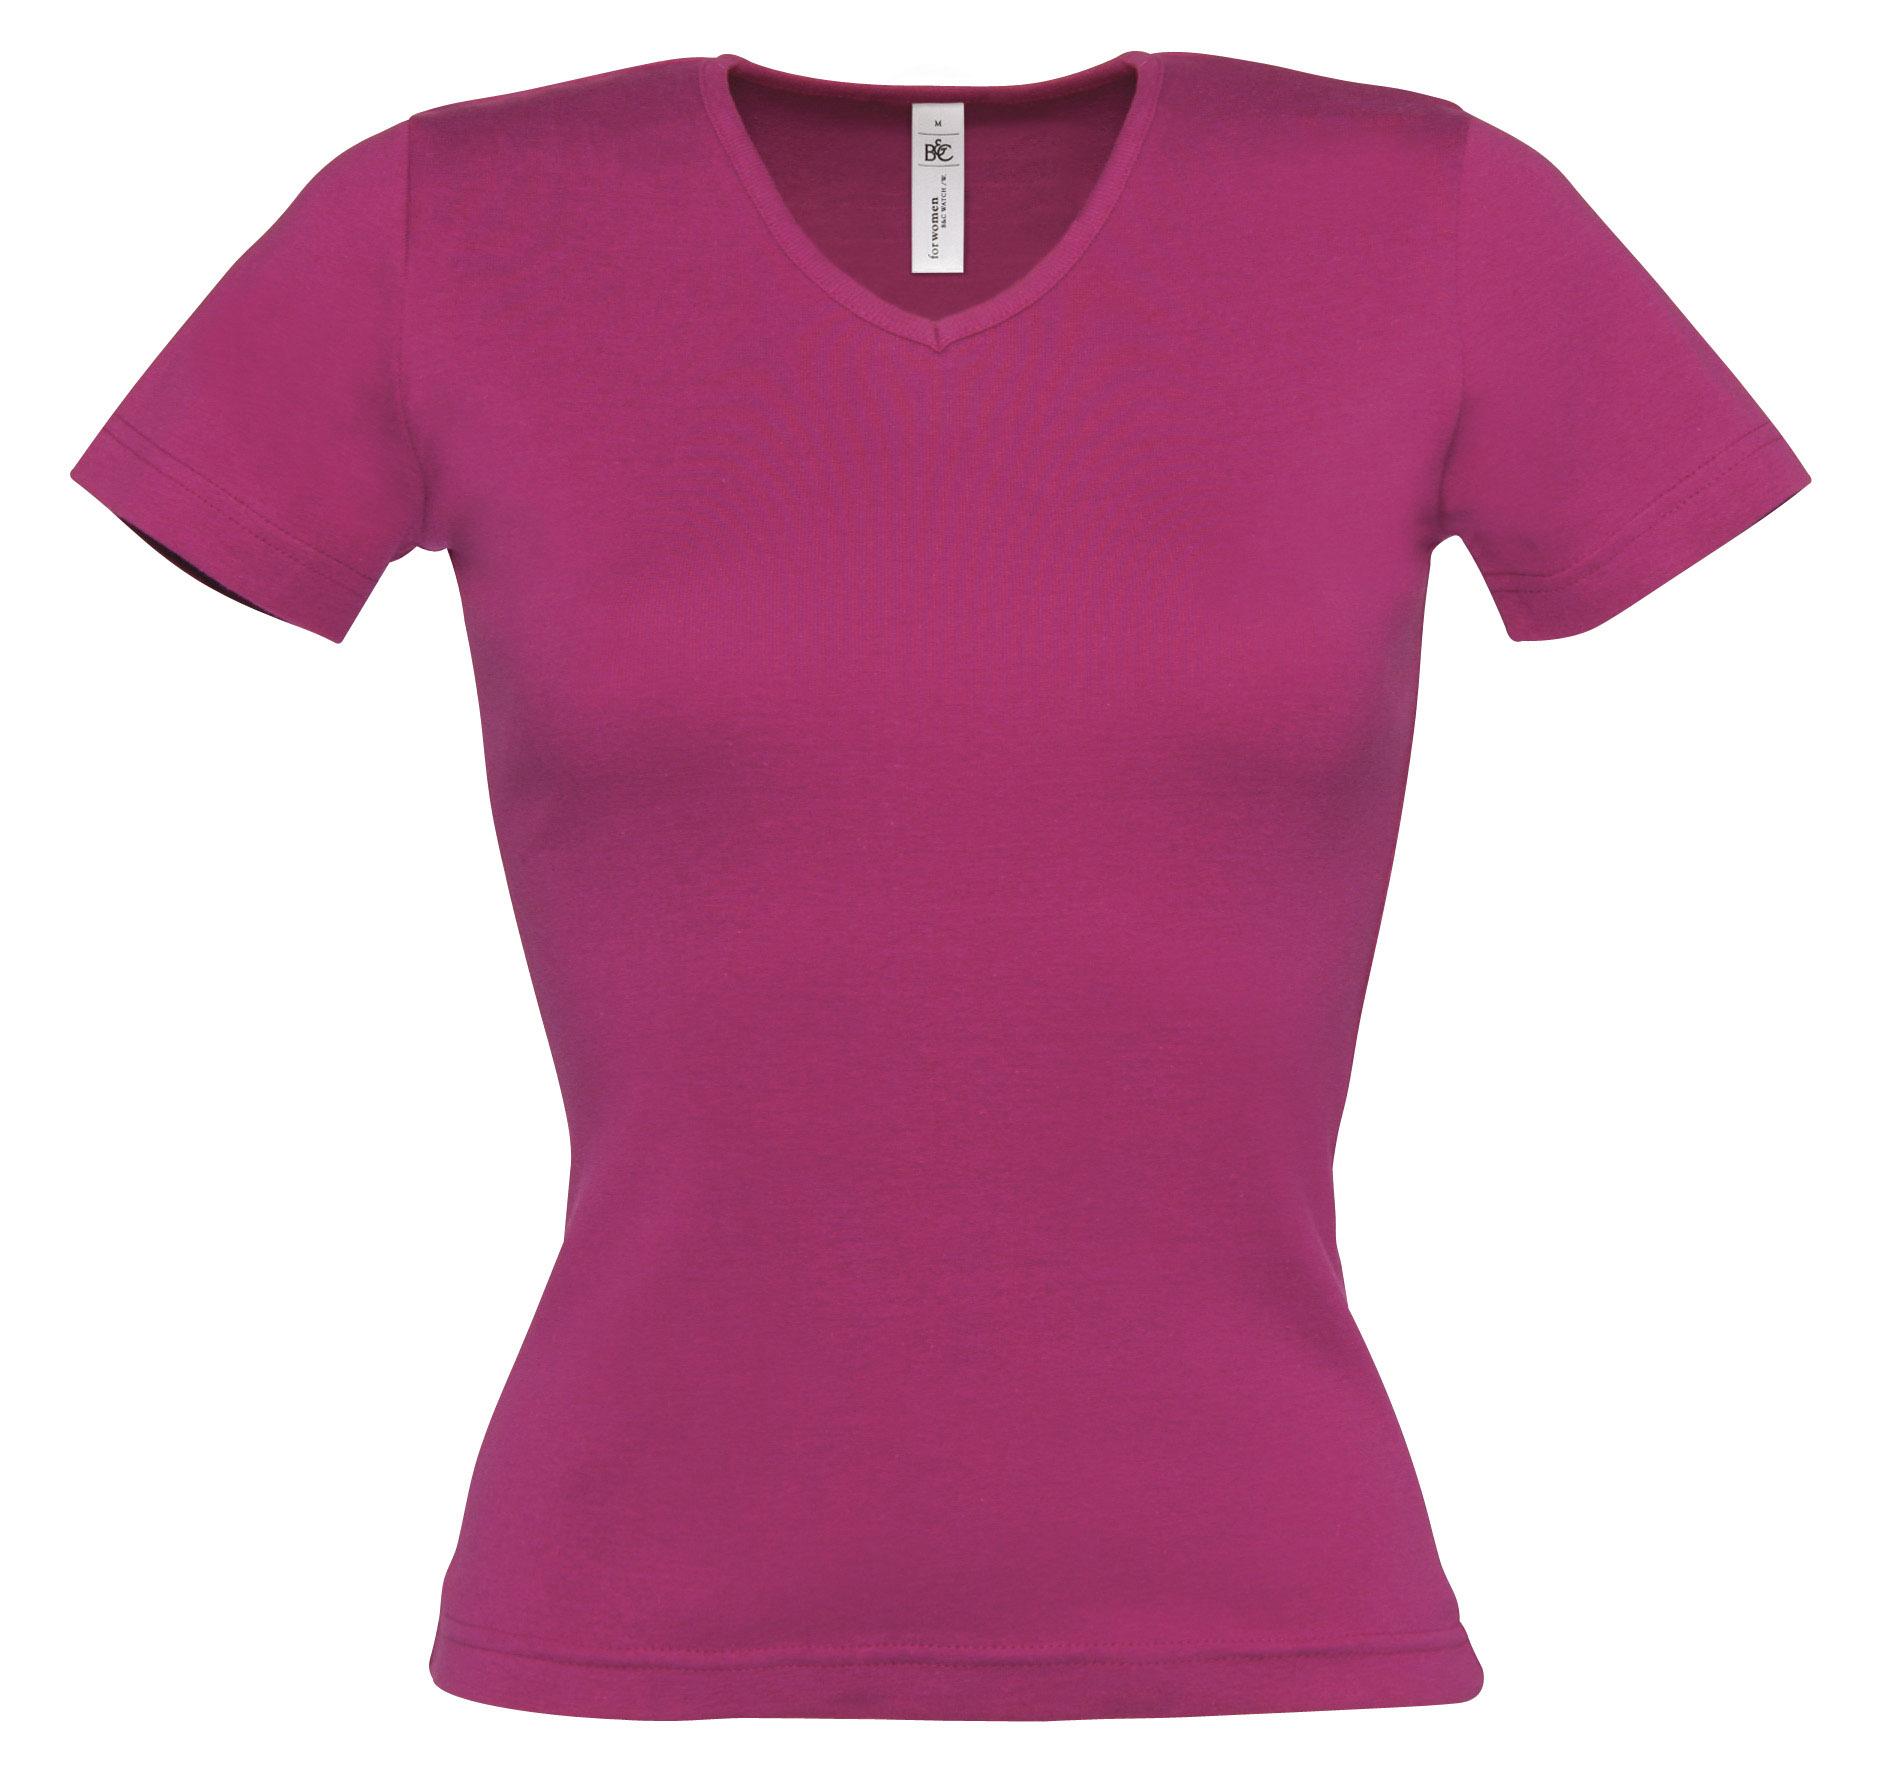 Tee shirt personnalis usa watcha t shirt classique - Faire tee shirt personnalise ...